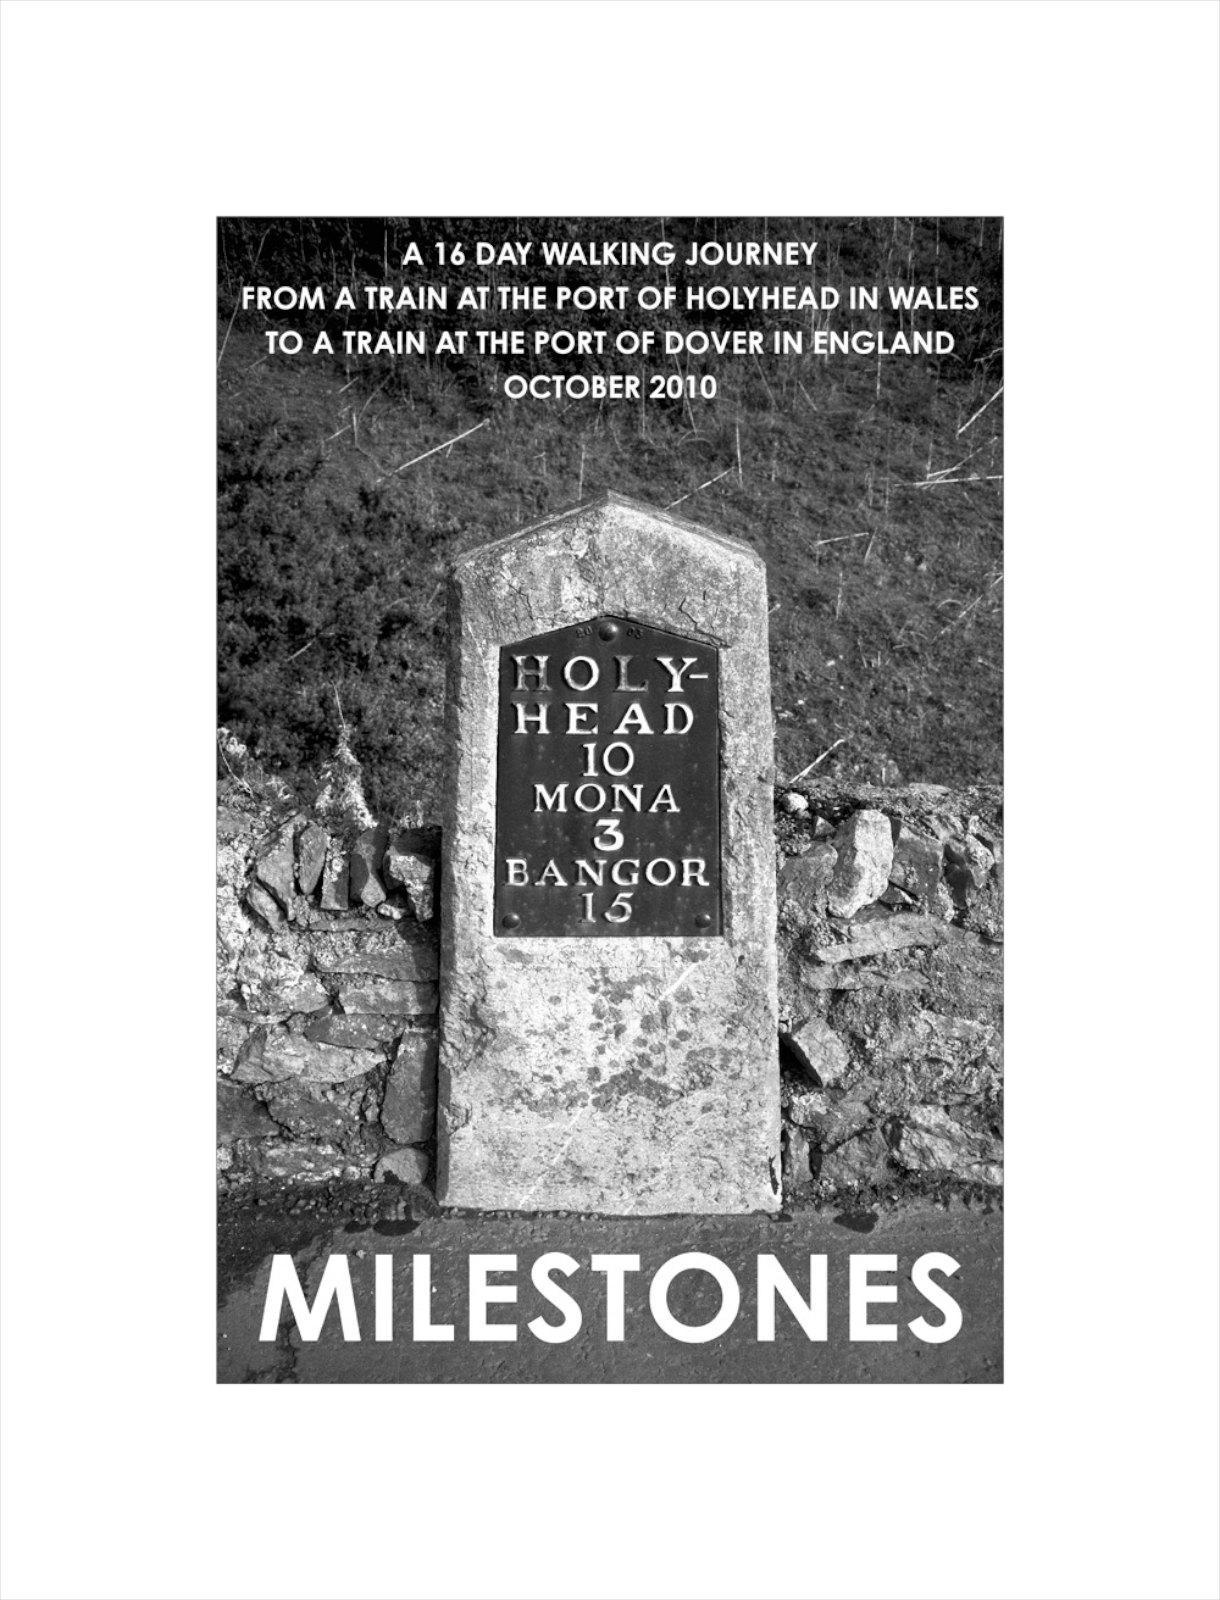 Milestones, Wales England, 2010, giclée print, 56,5 x 43 cm